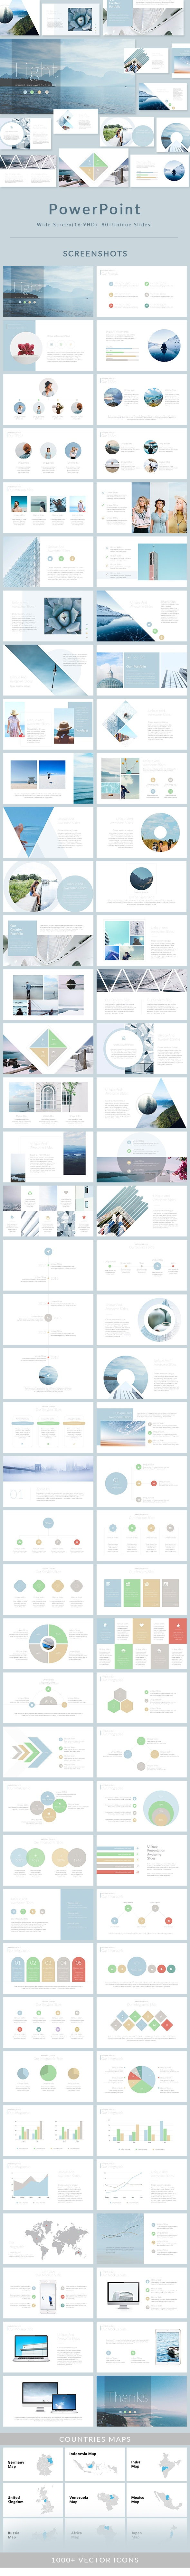 Light - PowerPoint Presentation Template - Business PowerPoint Templates